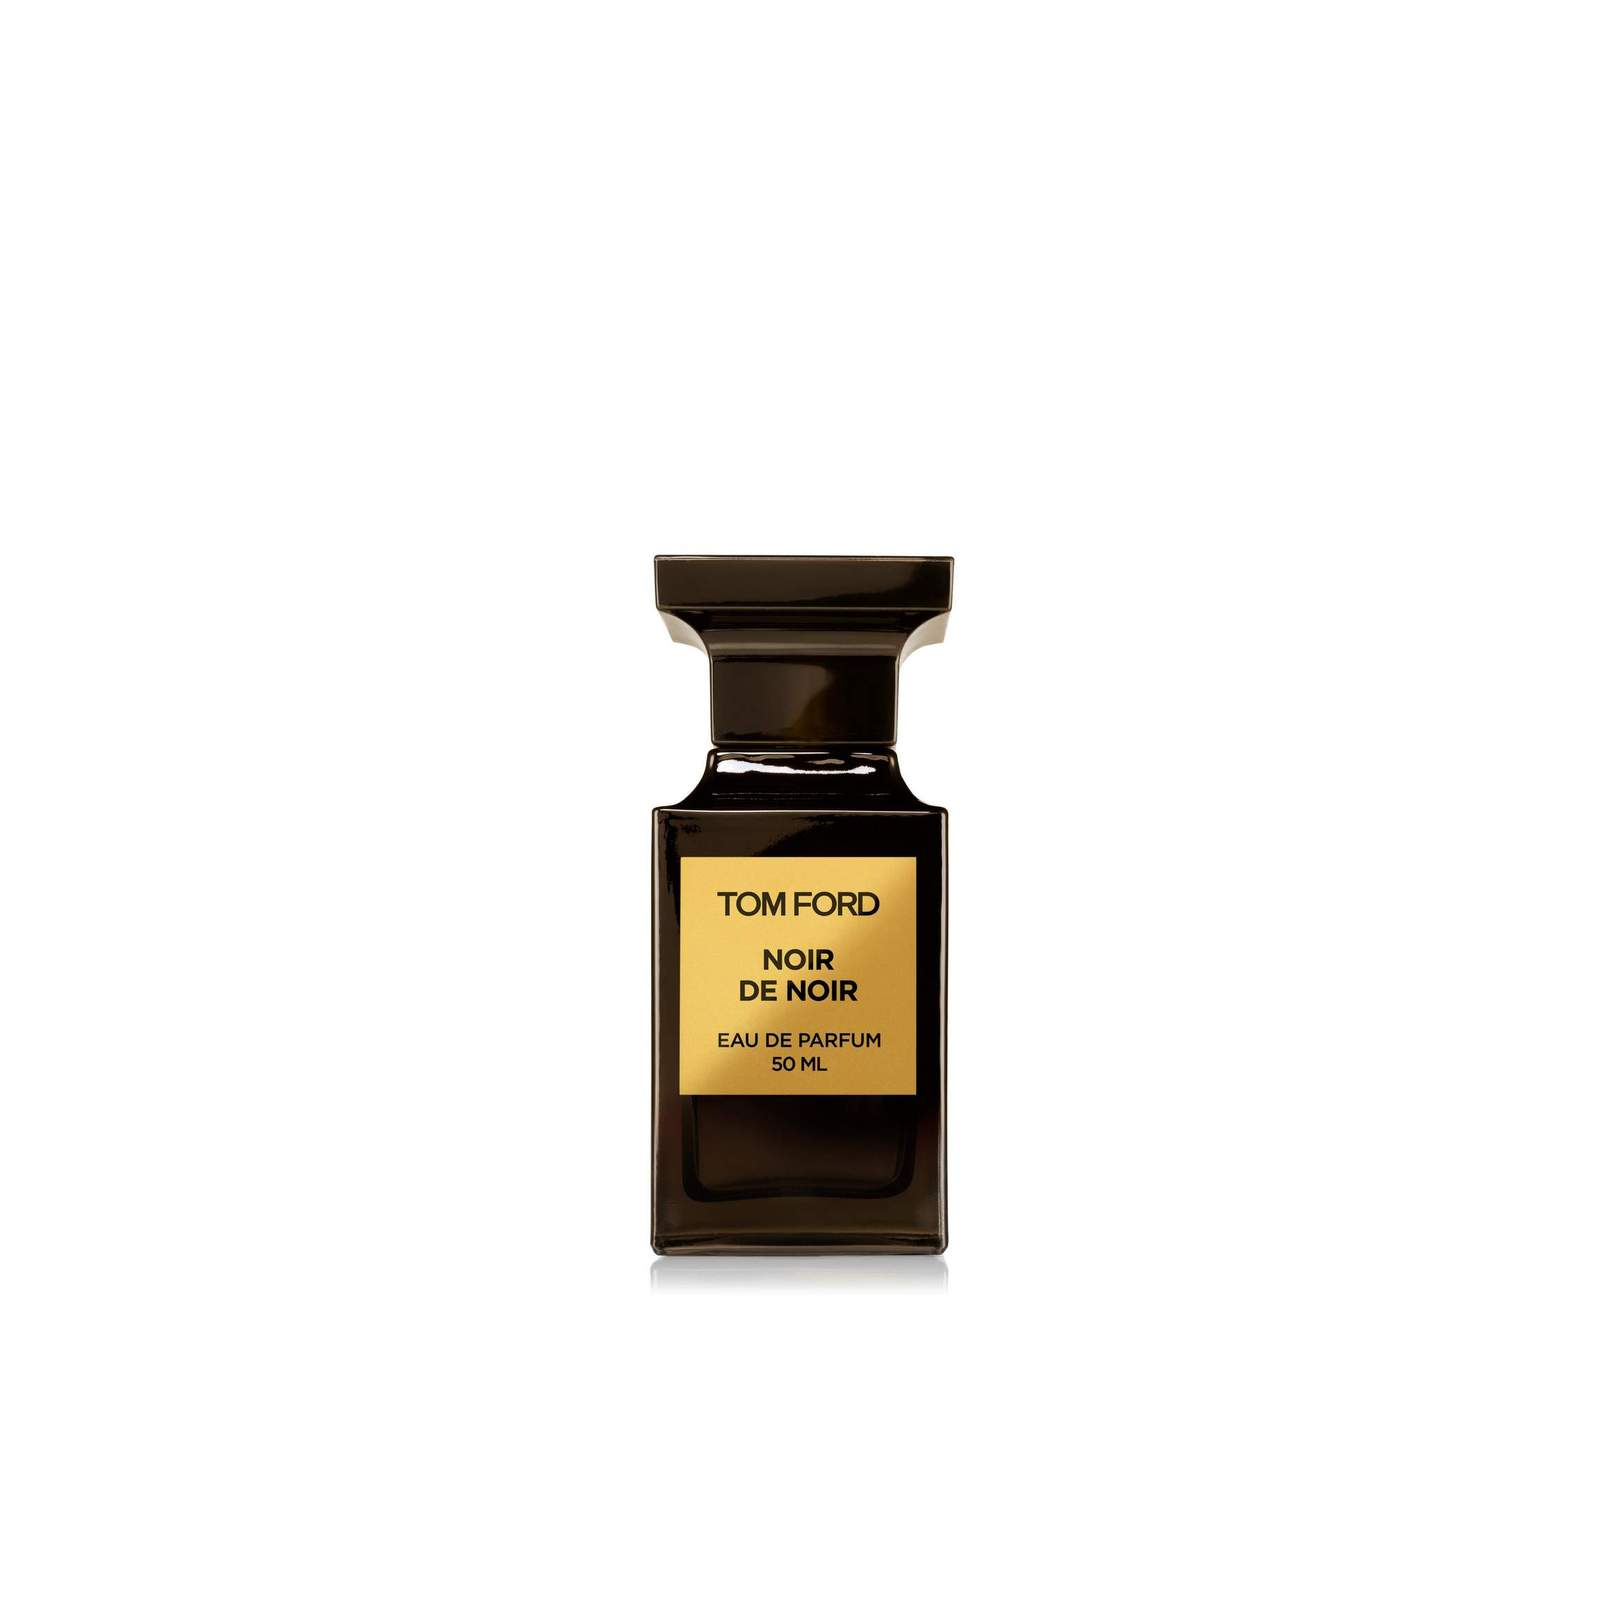 NOIR DE NOIR by TOM FORD 5ml Travel Spray OUD SAFFRON OAKMOSS Perfume